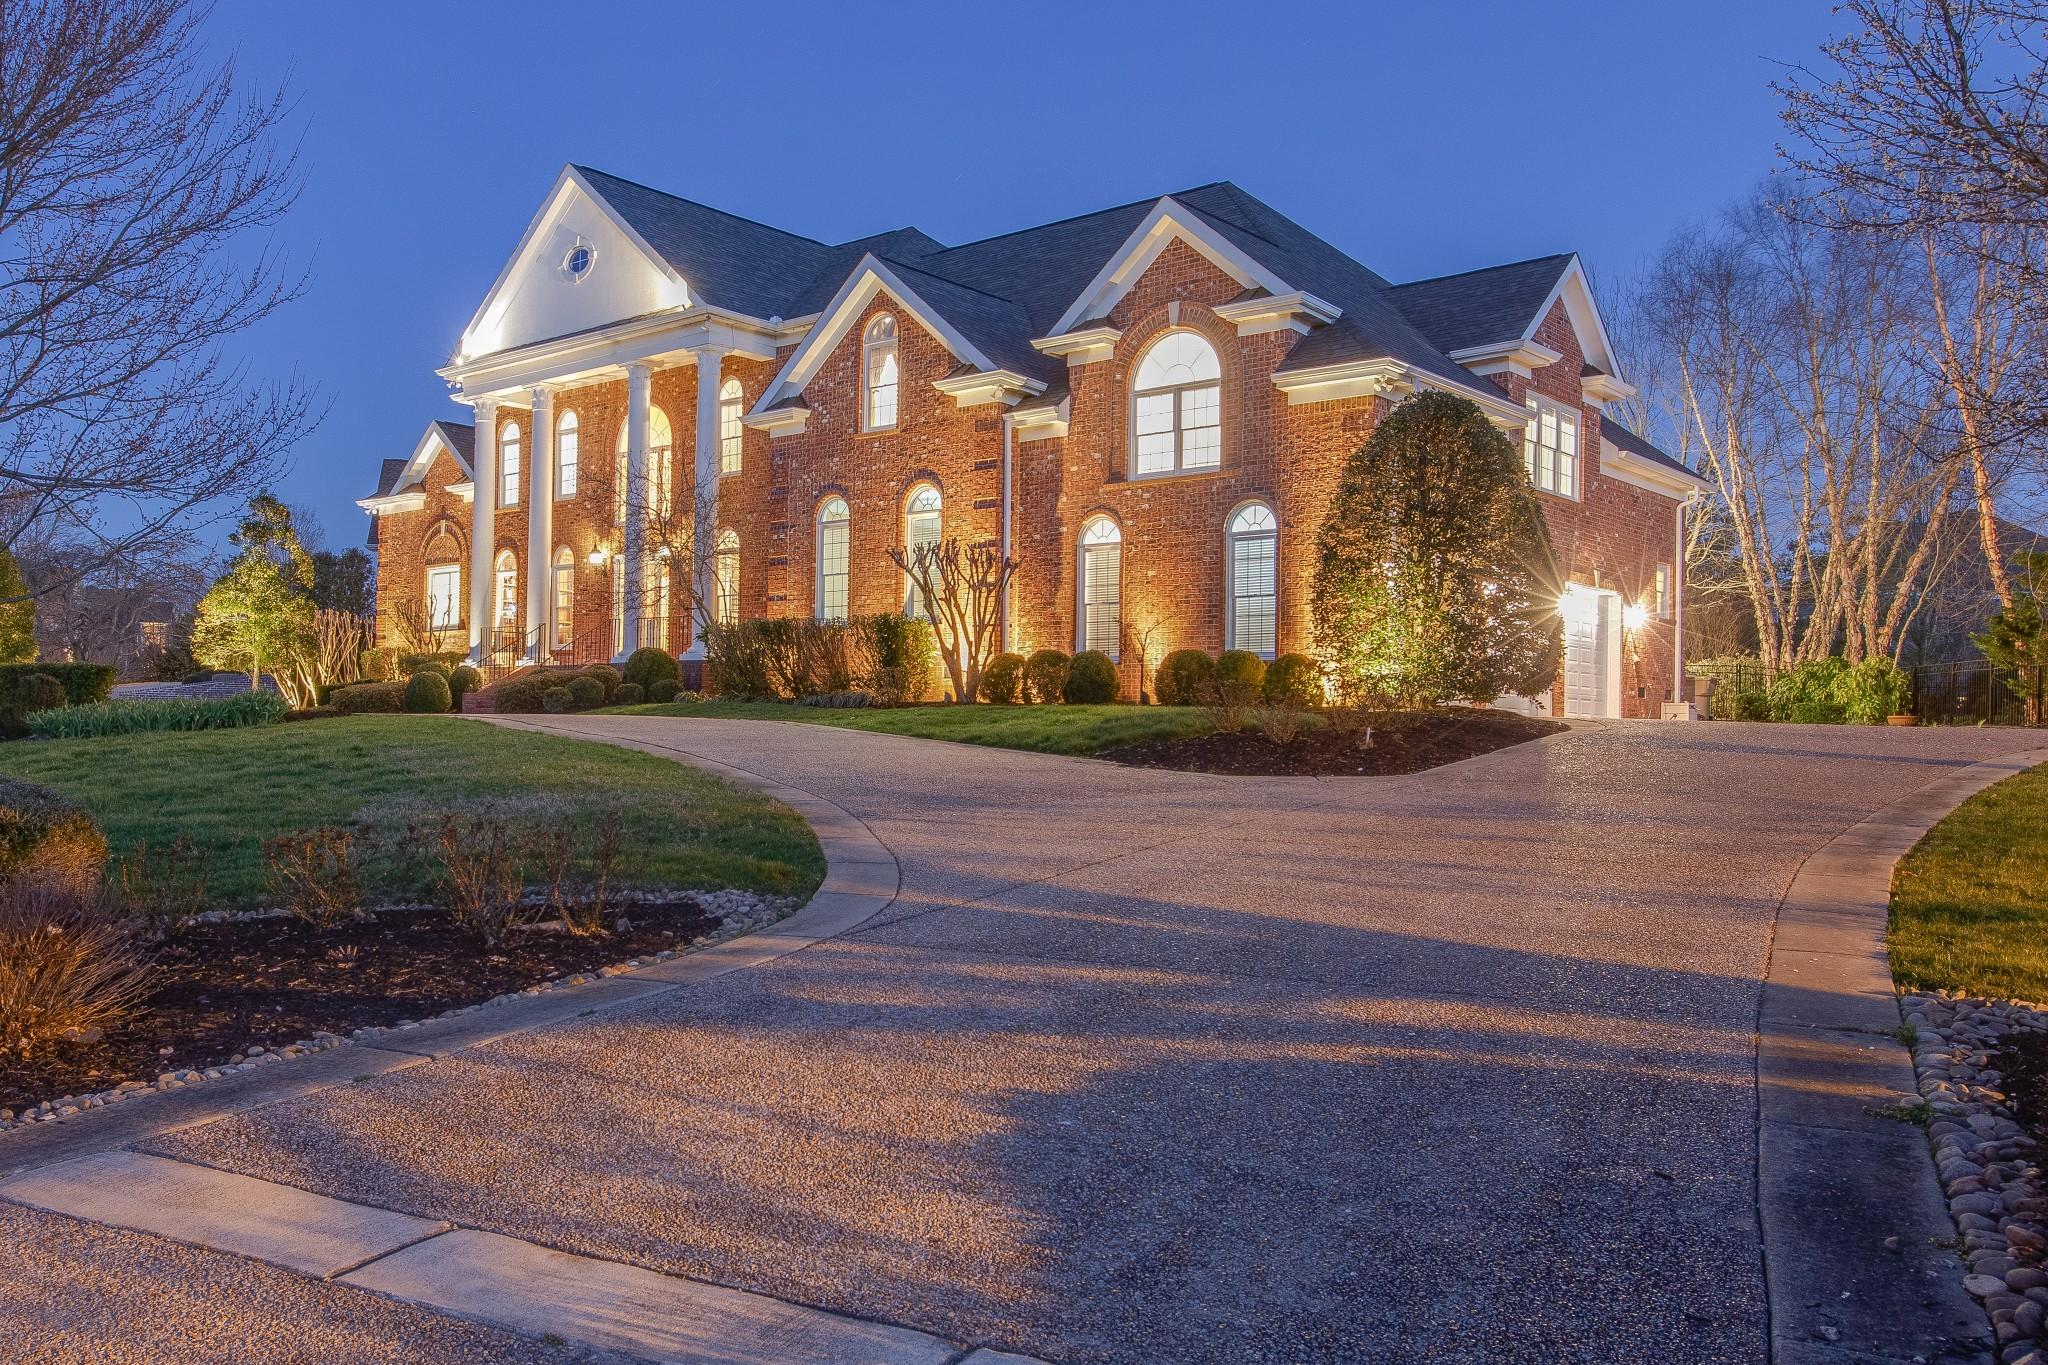 701 Sinclair Cir, Brentwood, TN 37027 - Brentwood, TN real estate listing